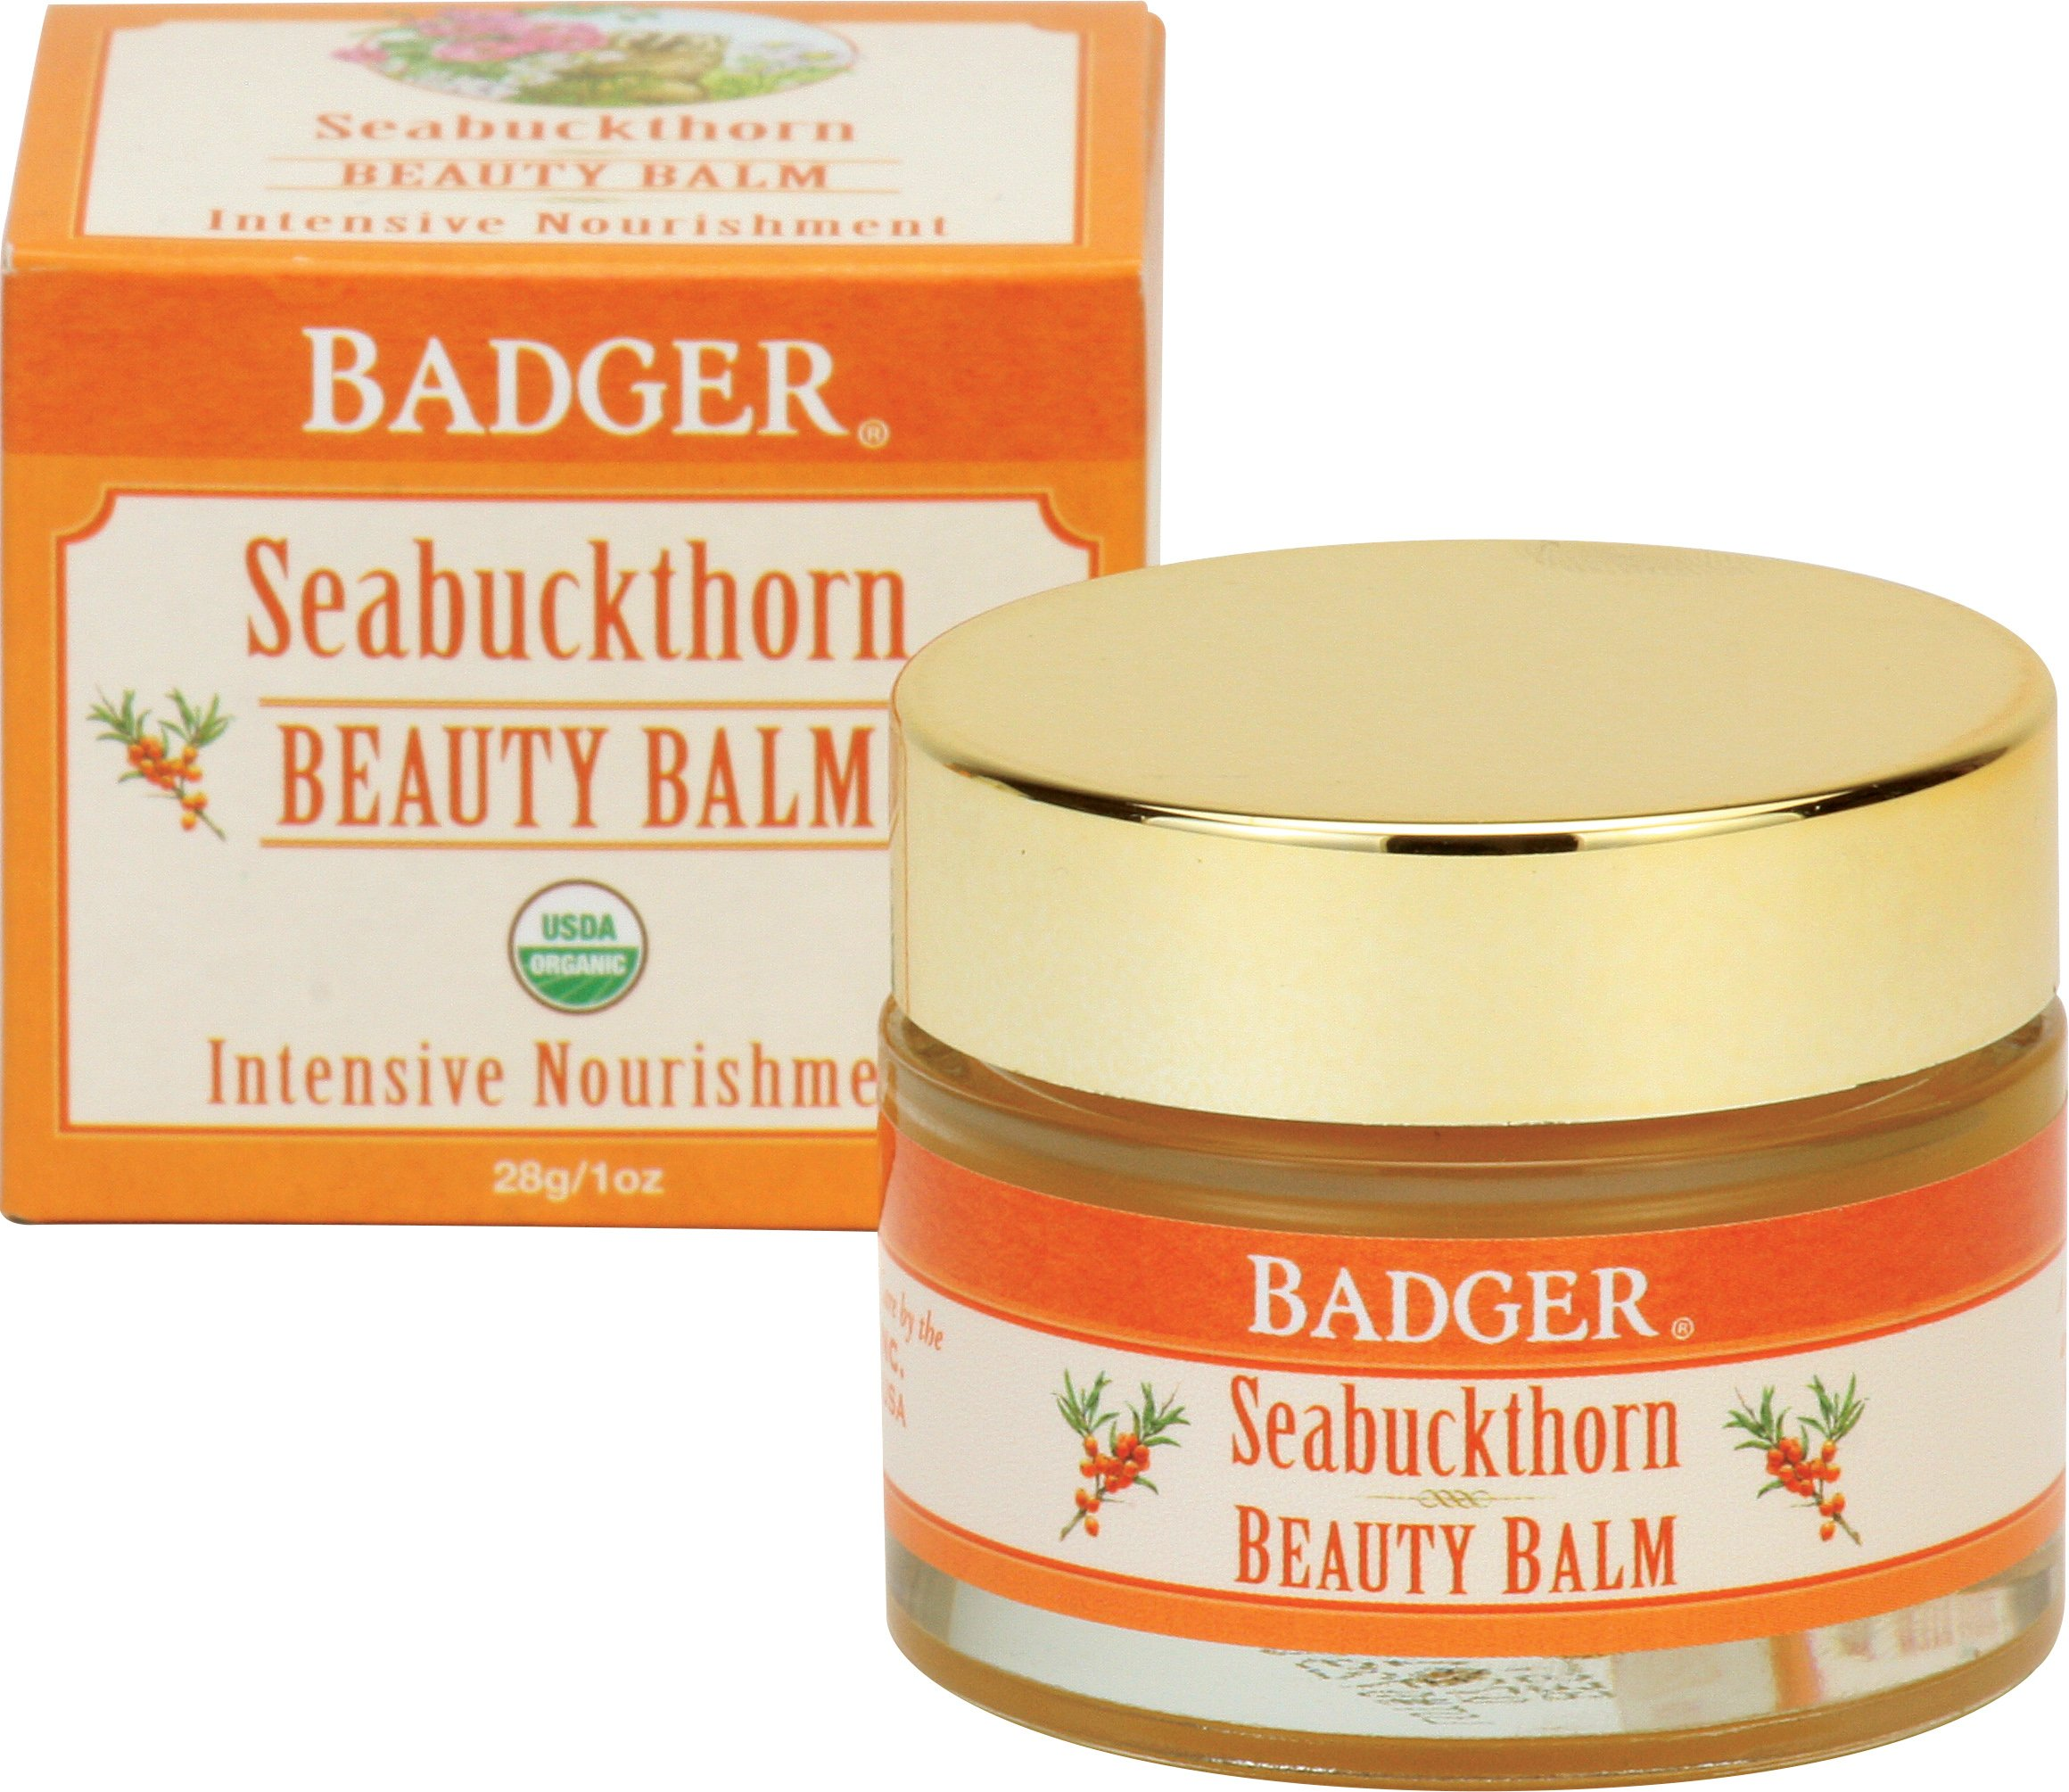 Badger Seabuckthorn Beauty Balm - 1 oz Glass Jar